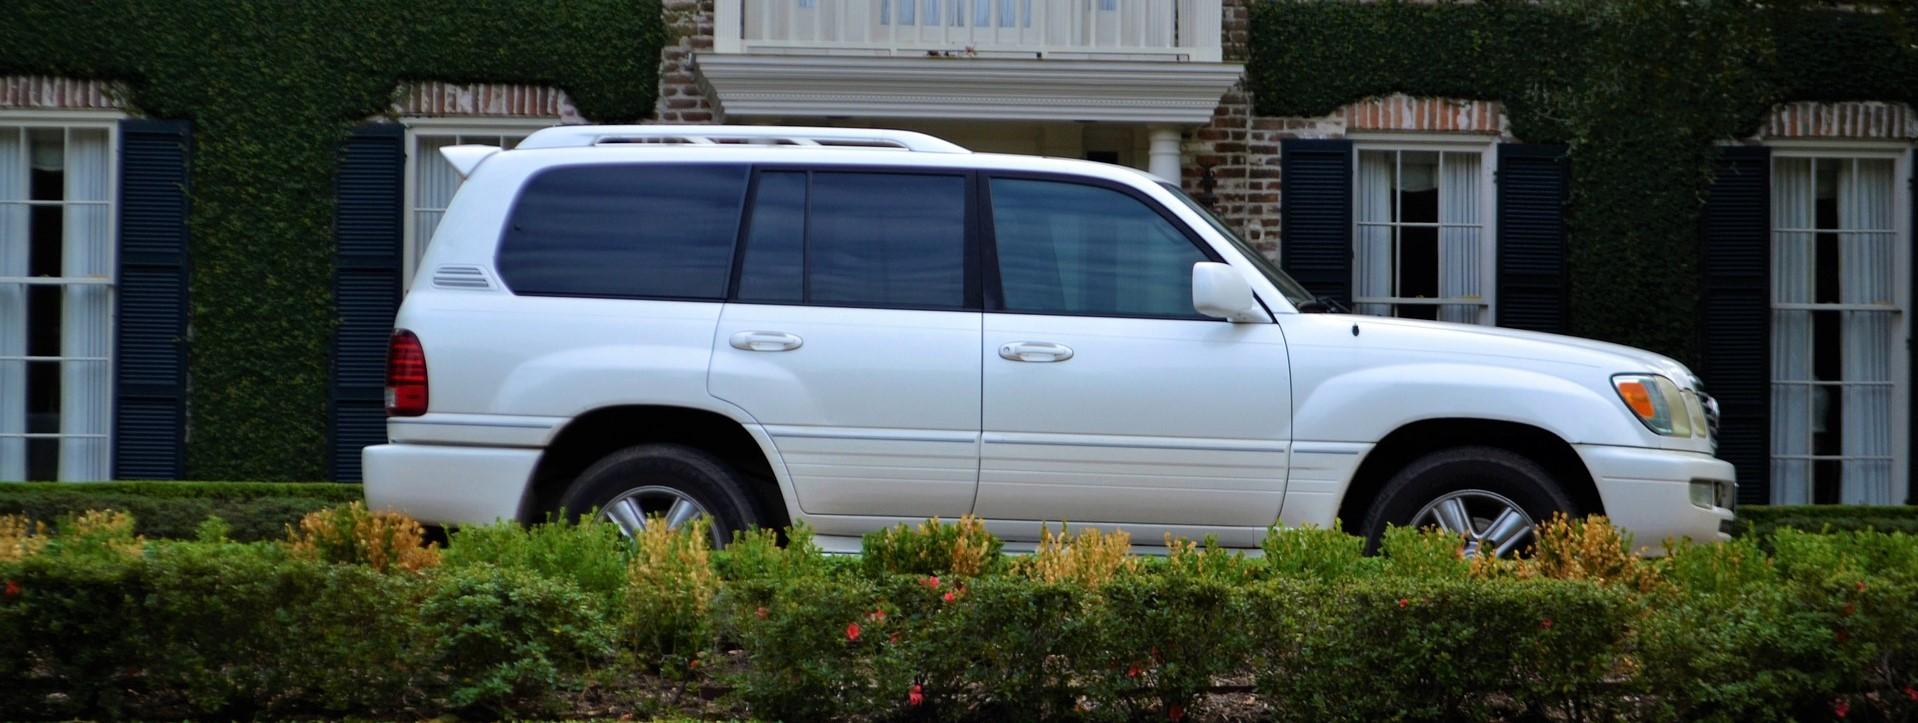 White SUV in Pasadena, California   Breast Cancer Car Donations